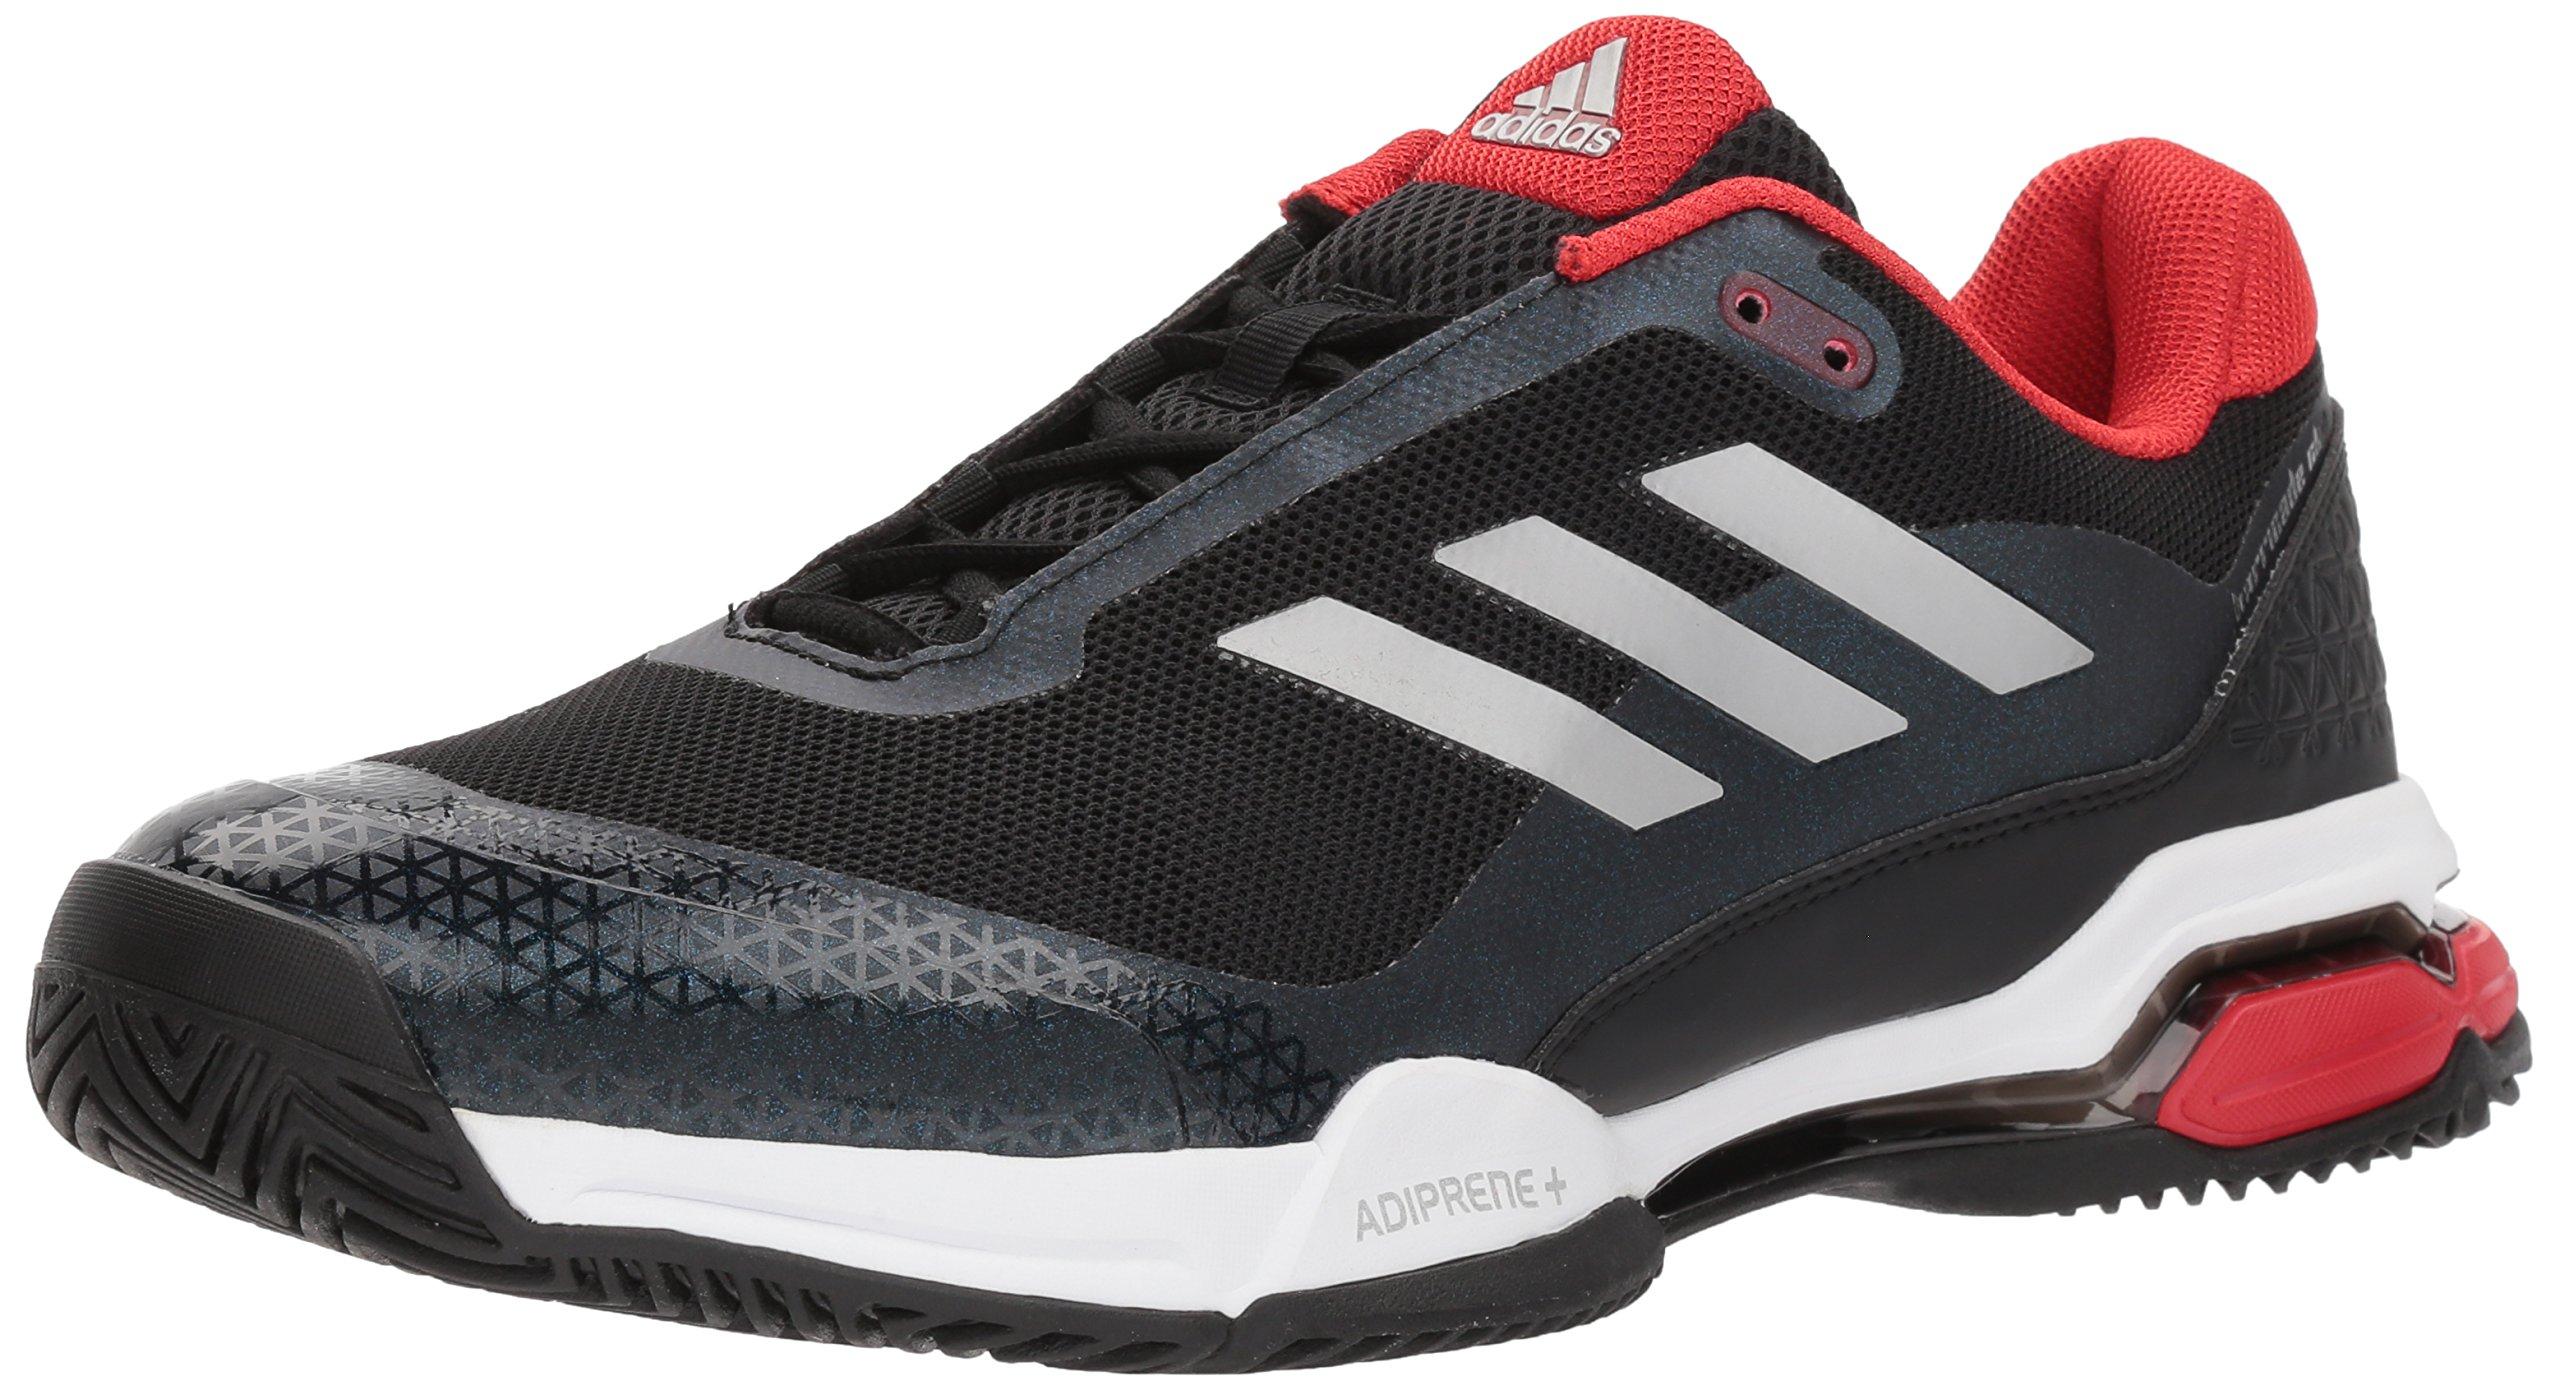 adidas Performance Men's Barricade Club Tennis Shoe, Black/Matte Silver/White, 9.5 M US by adidas